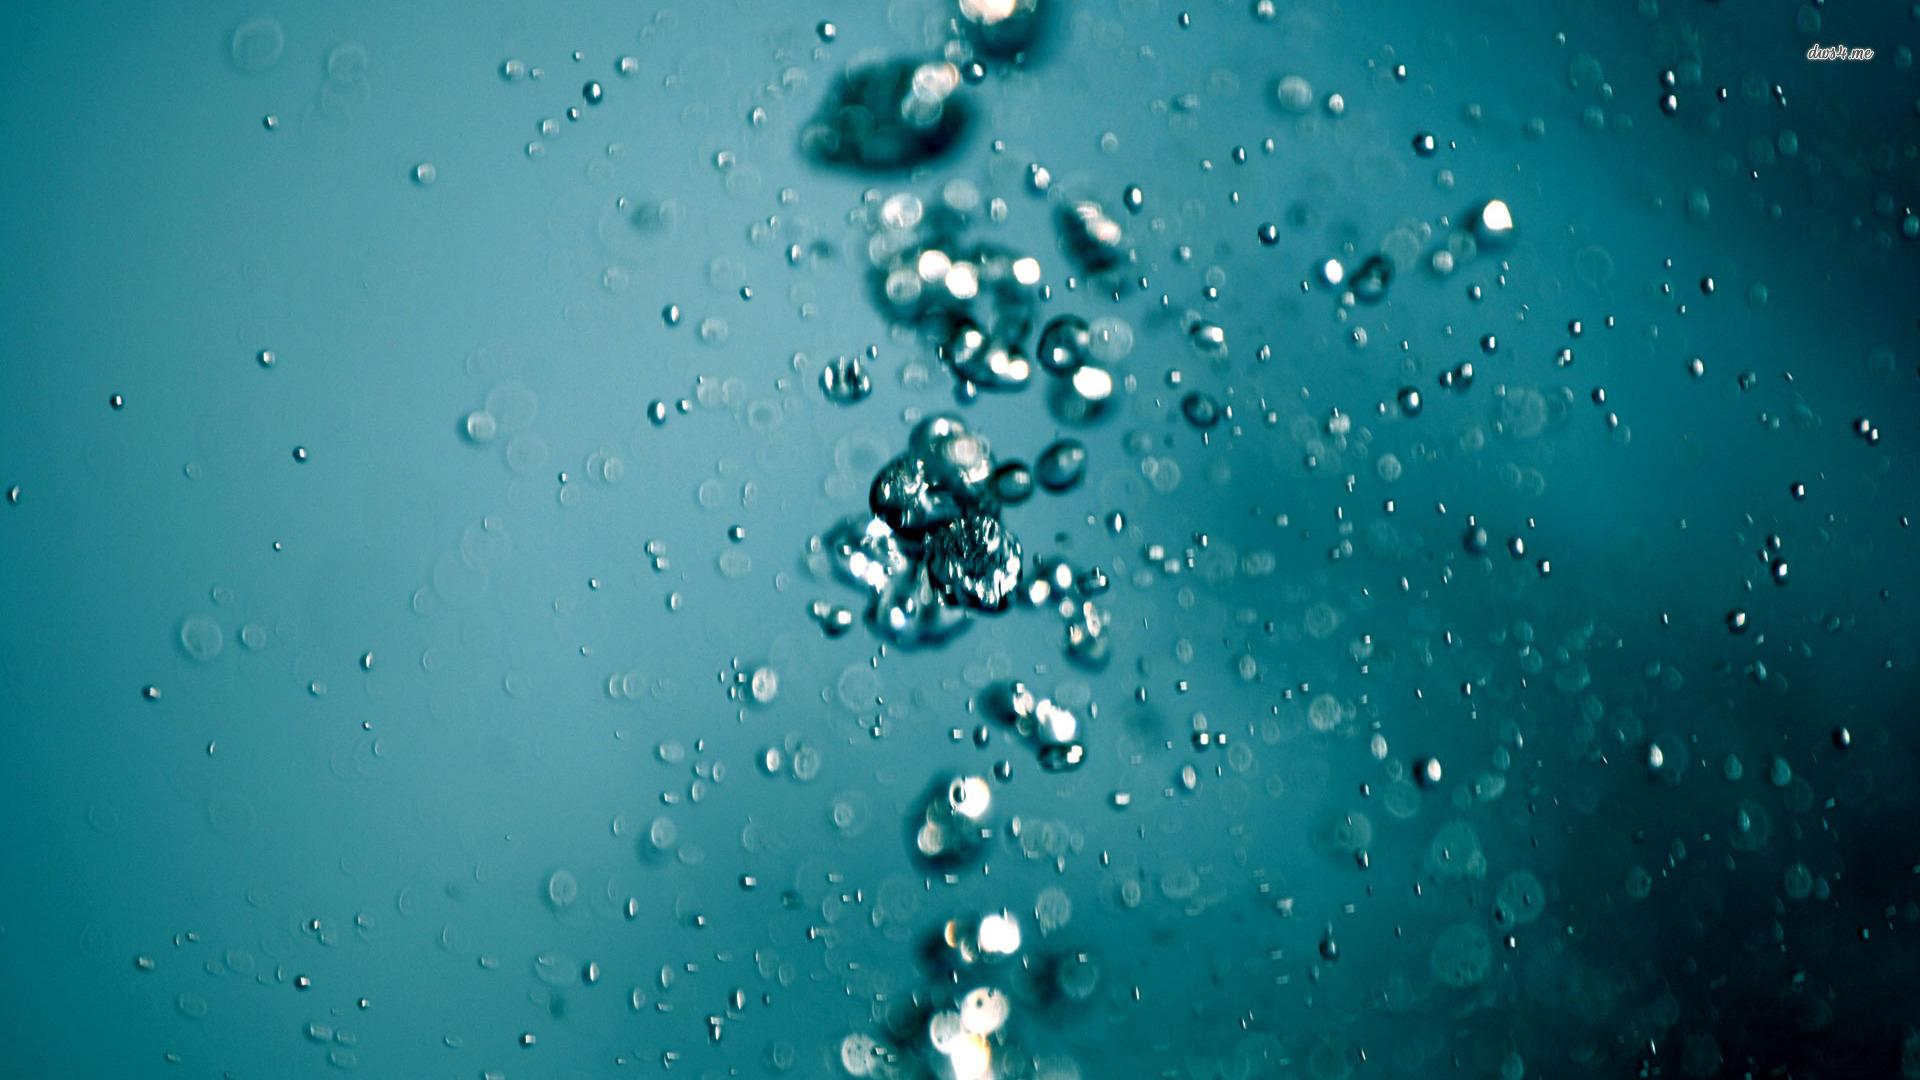 Underwater HD Wallpapers 1920x1080 - WallpaperSafari